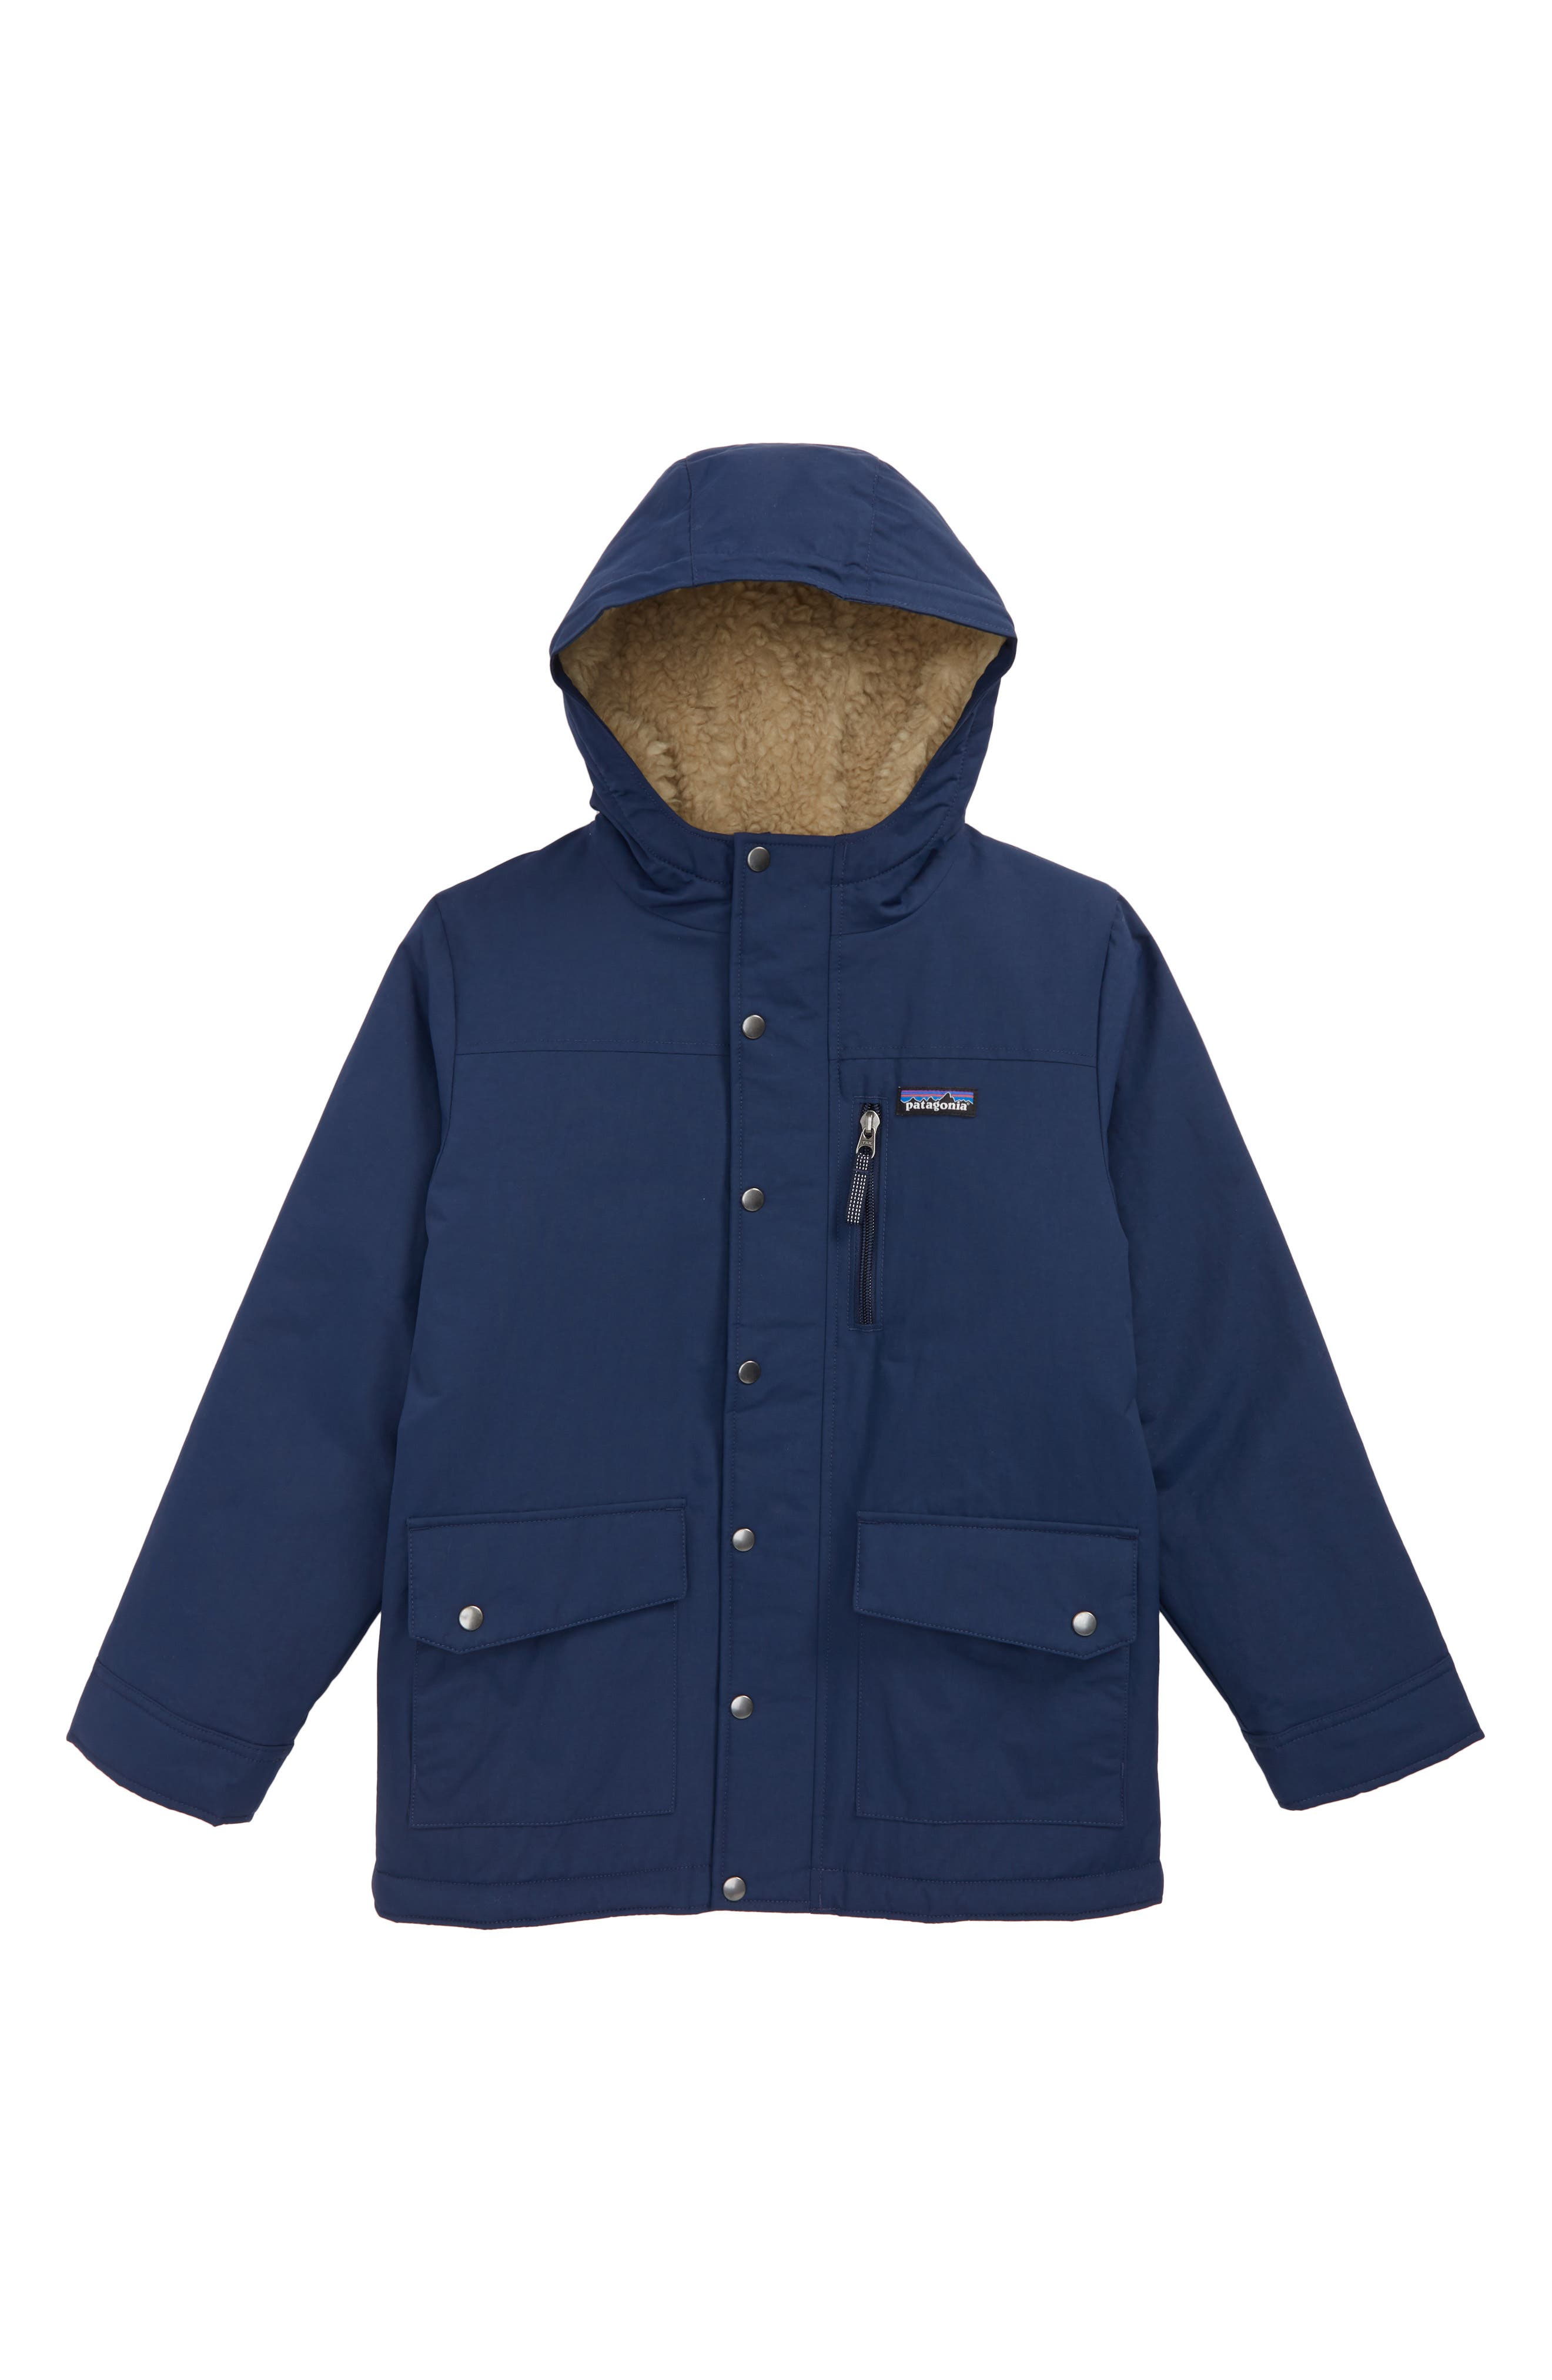 Infurno Hooded Jacket,                         Main,                         color,